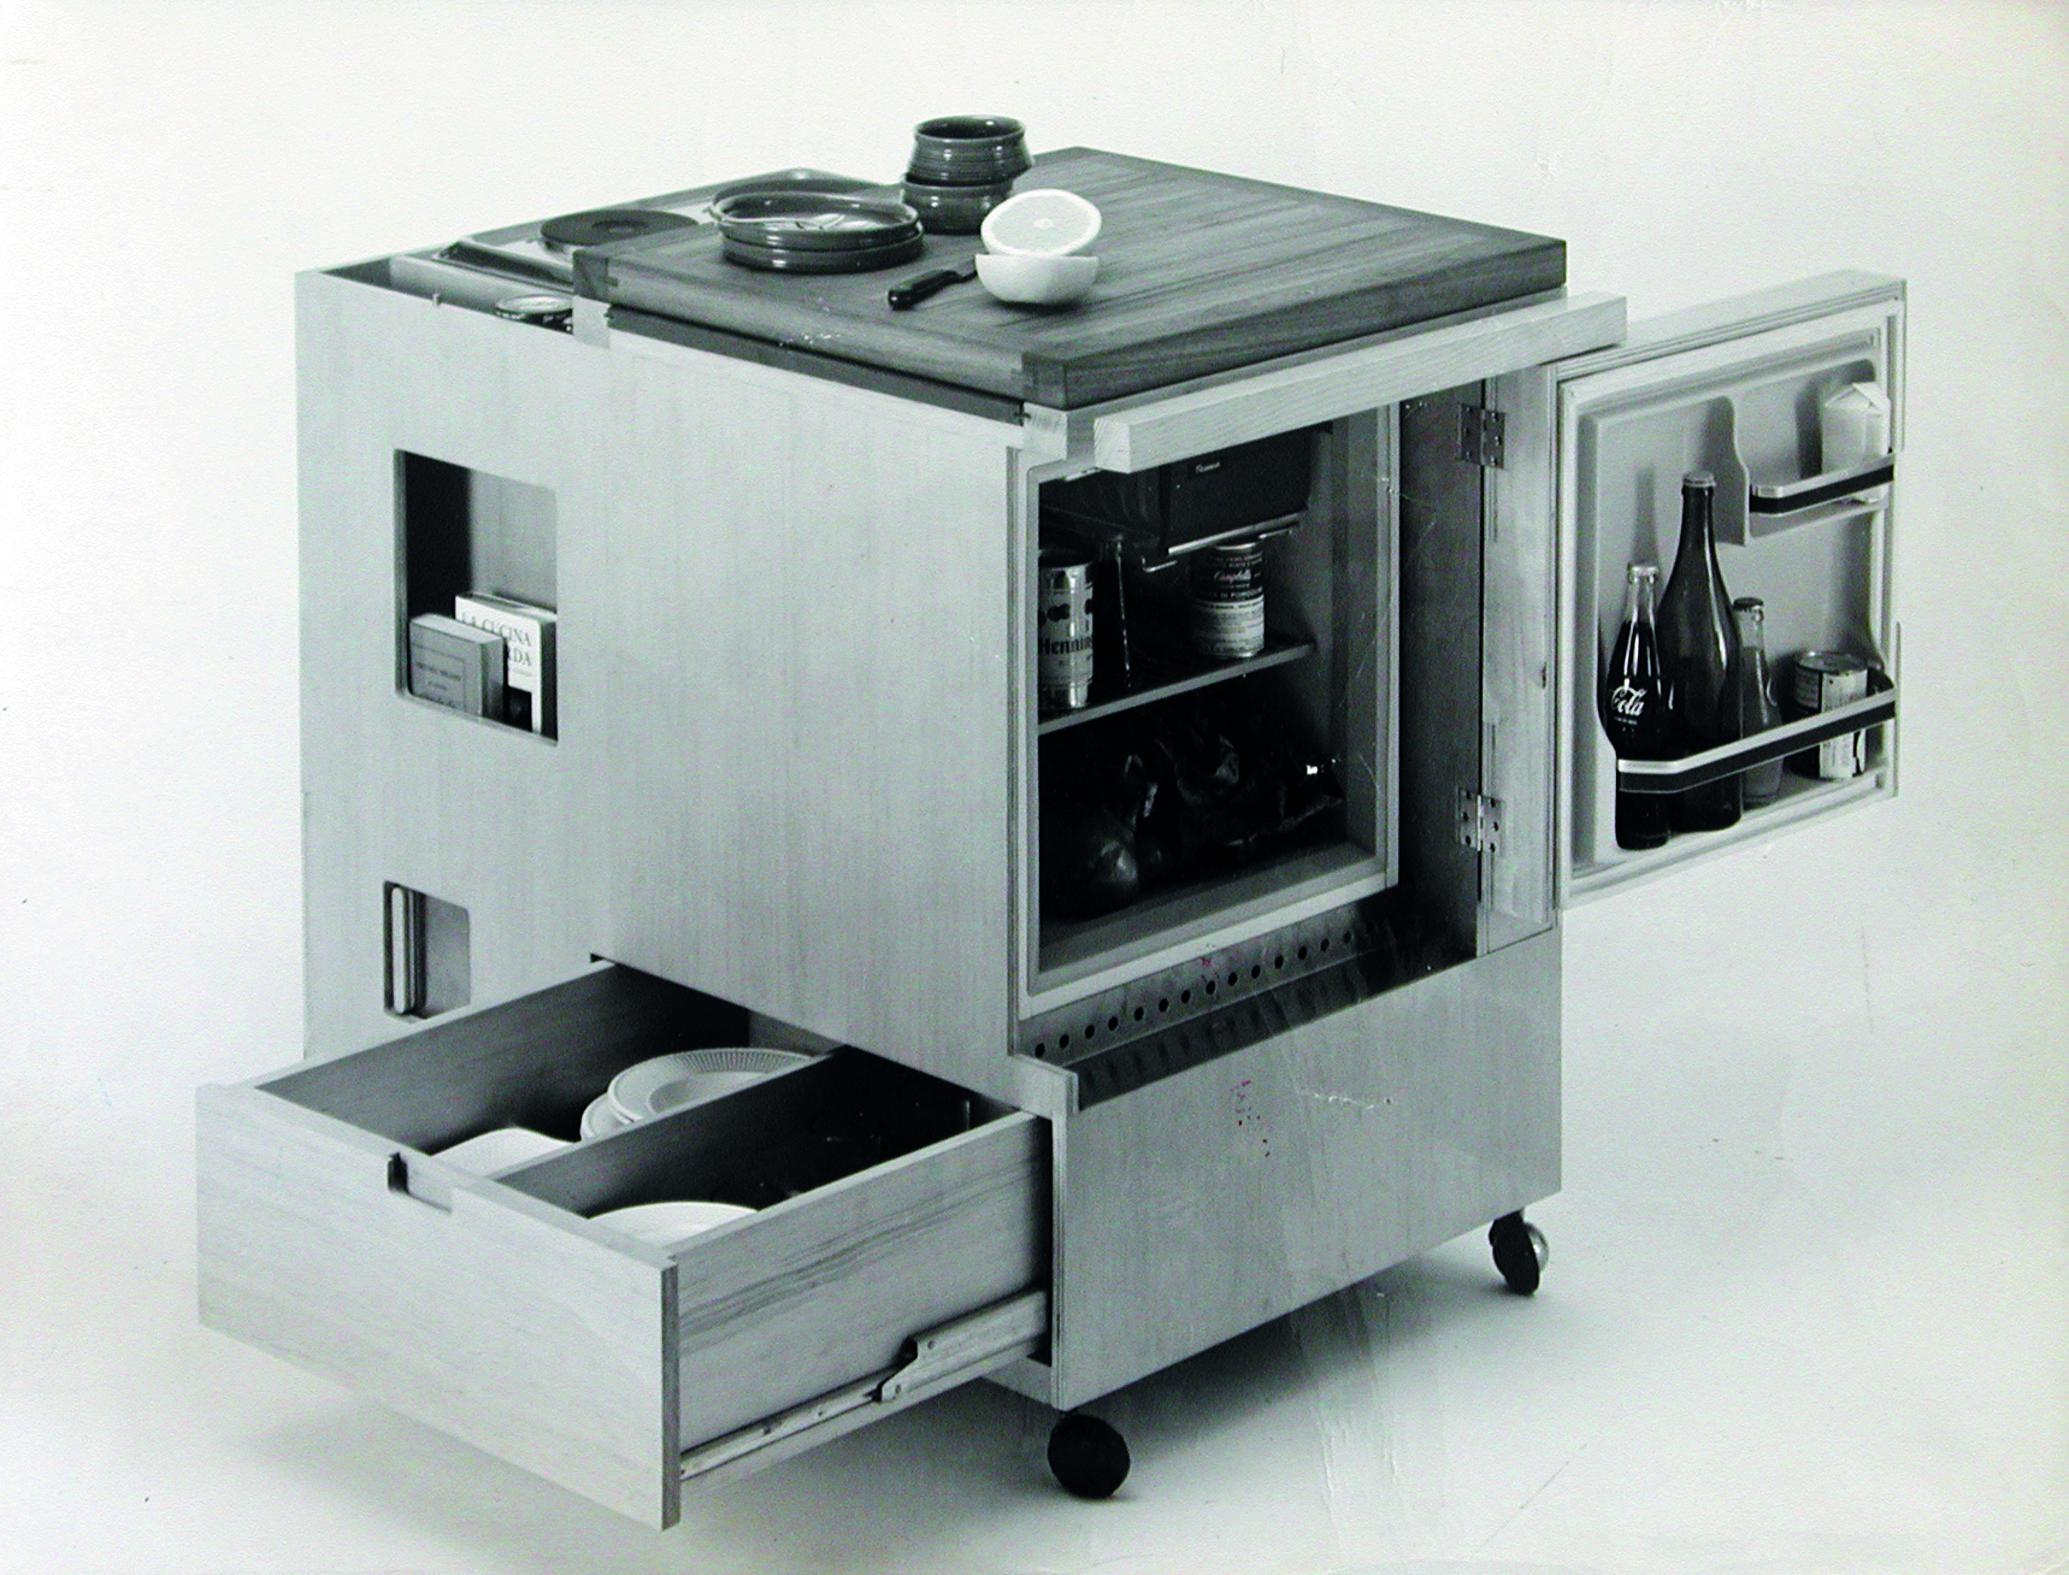 mini kitchen joe colombo boffi 1965 courtesy